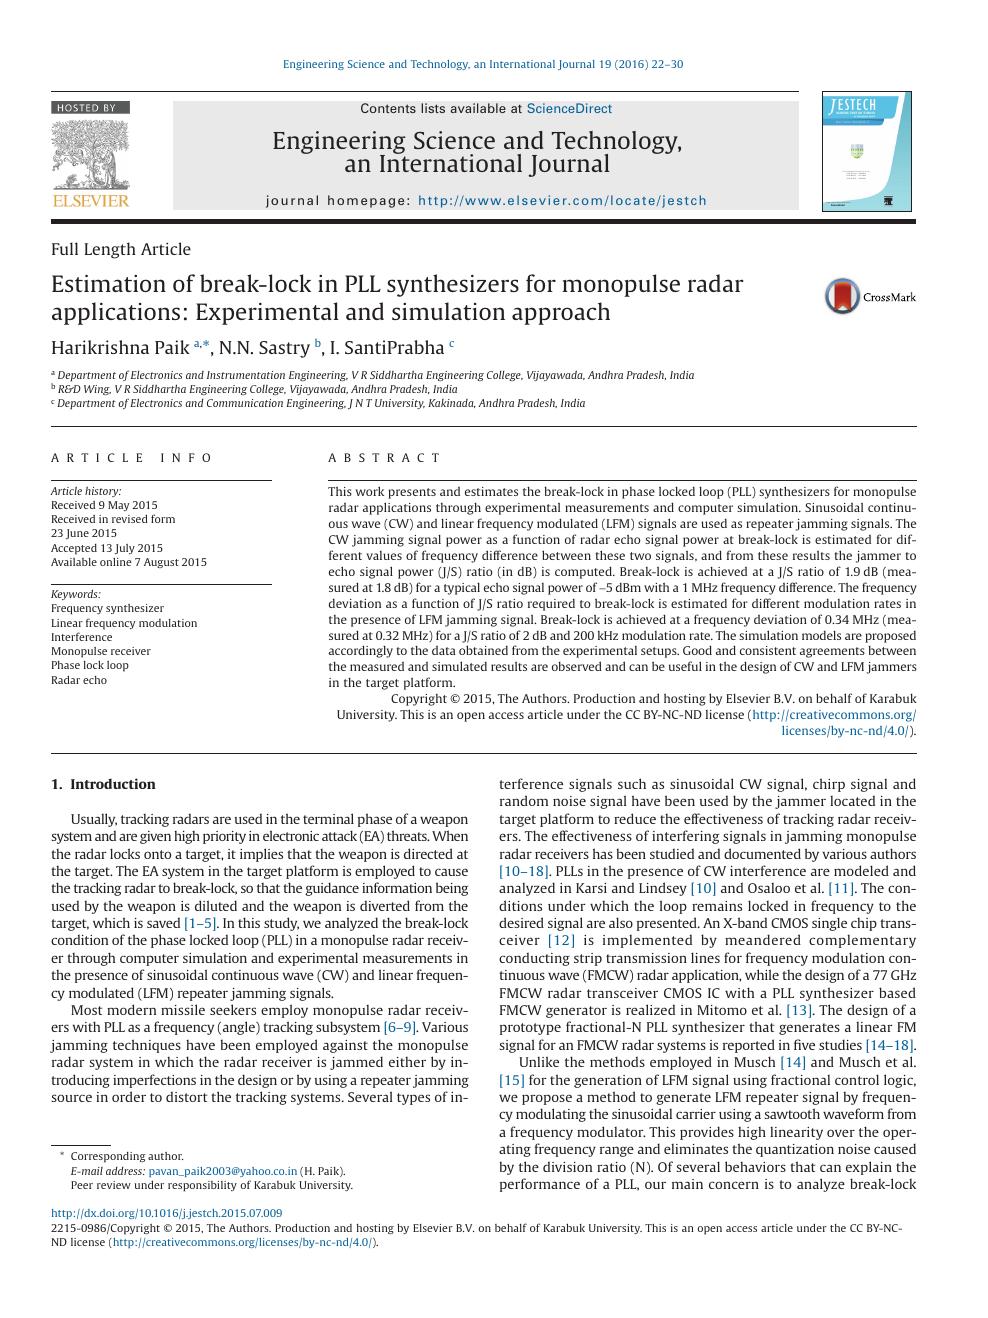 Estimation of break-lock in PLL synthesizers for monopulse radar